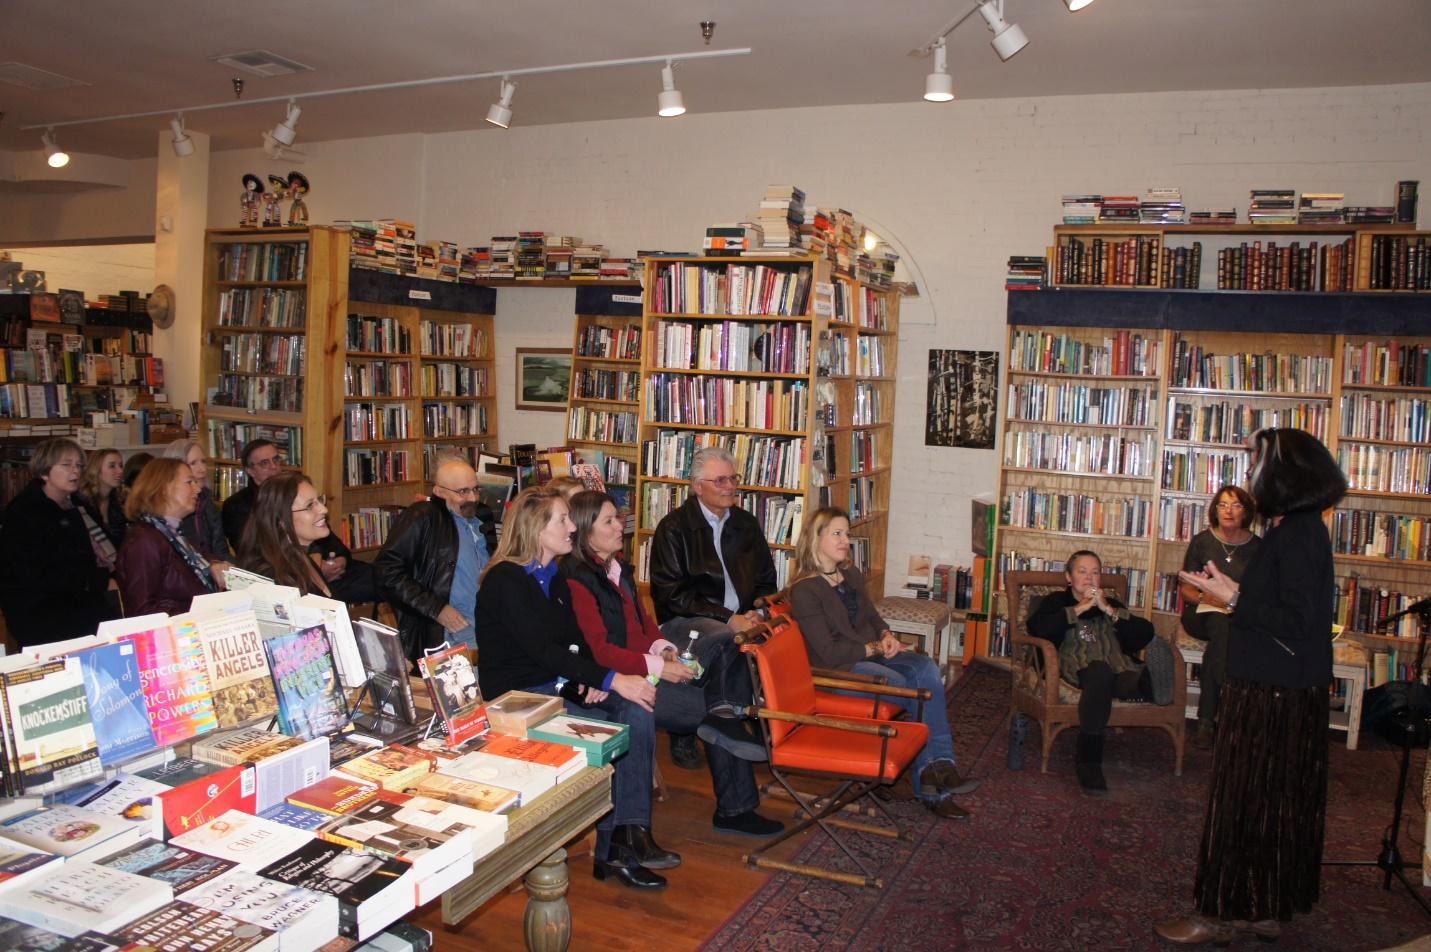 Book signing at Op Cit bookstore – Santa Fe, November 2013